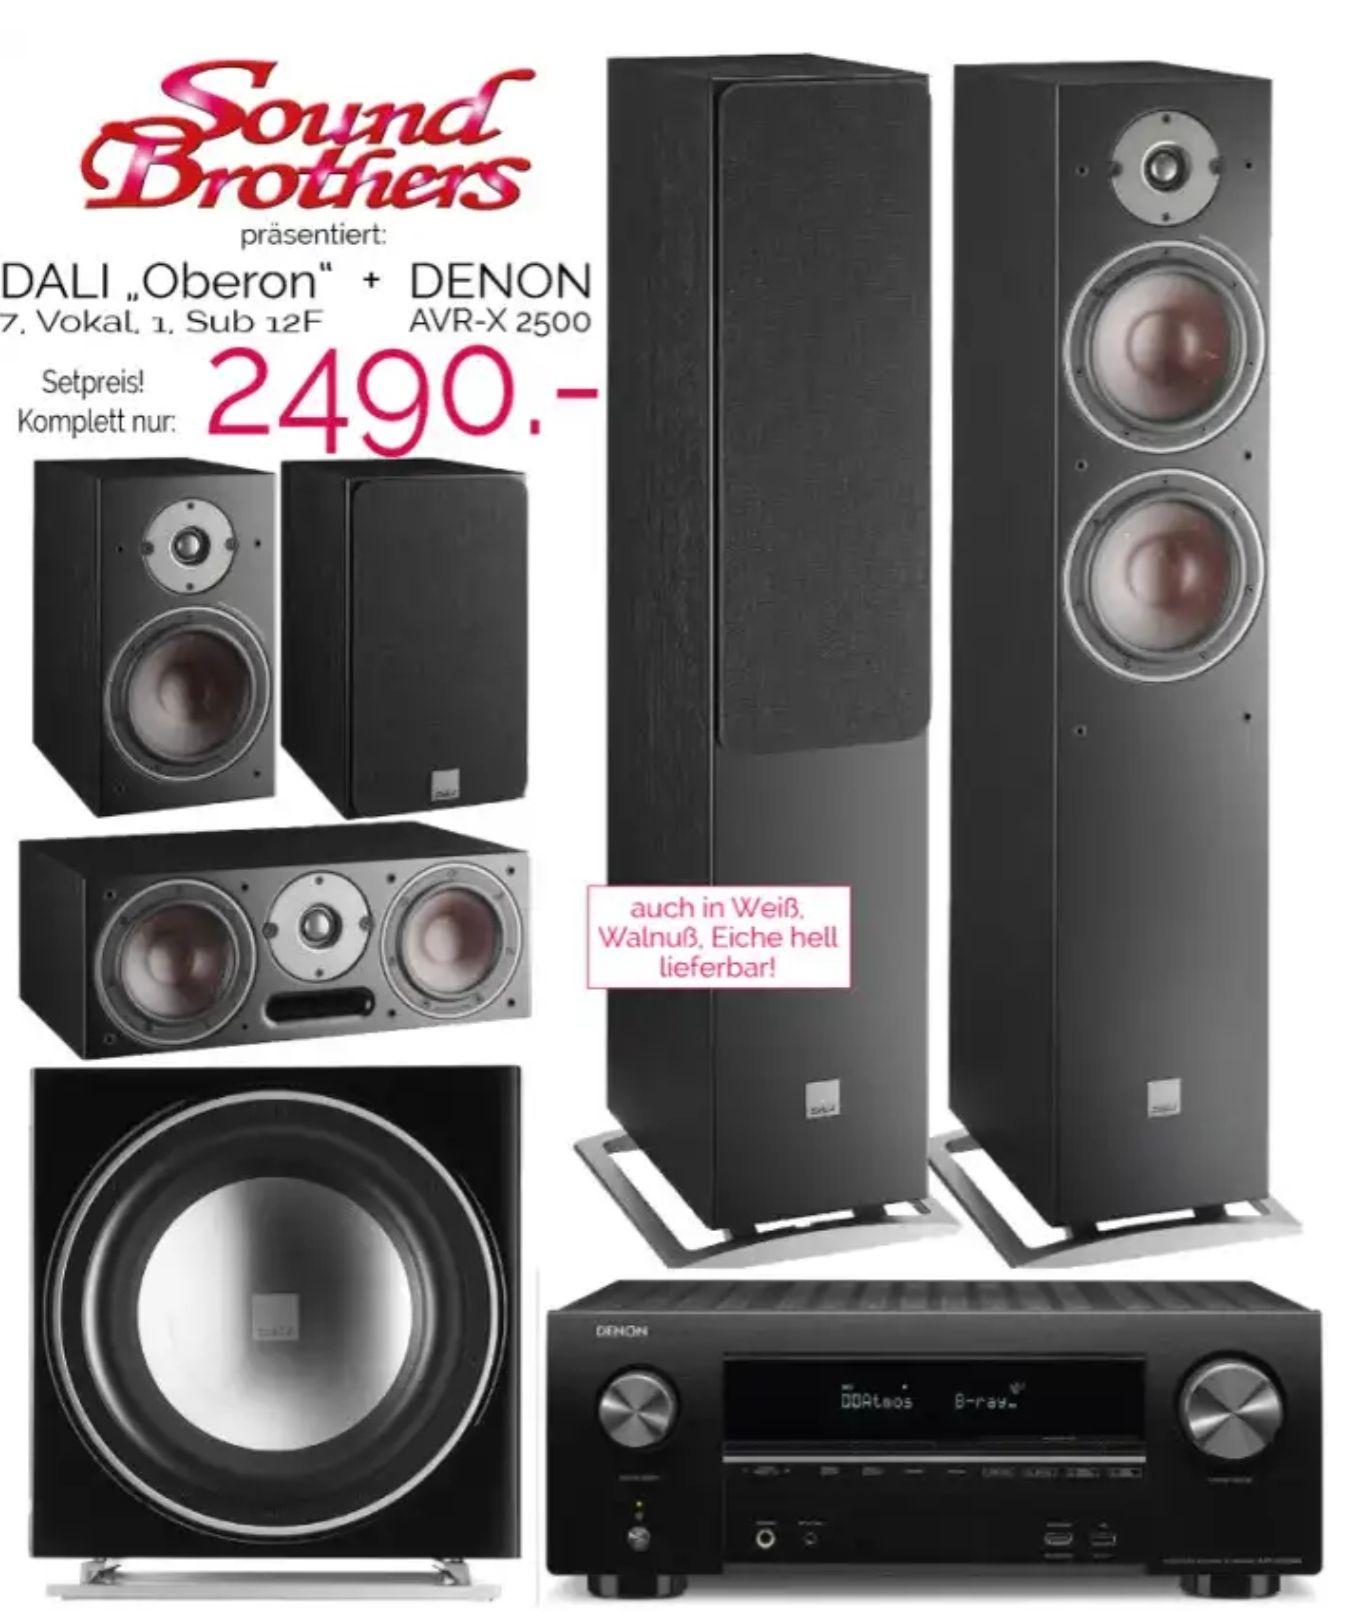 DENON AVR-X 2500 + DALI OBERON 7 - Lautsprecher Paket